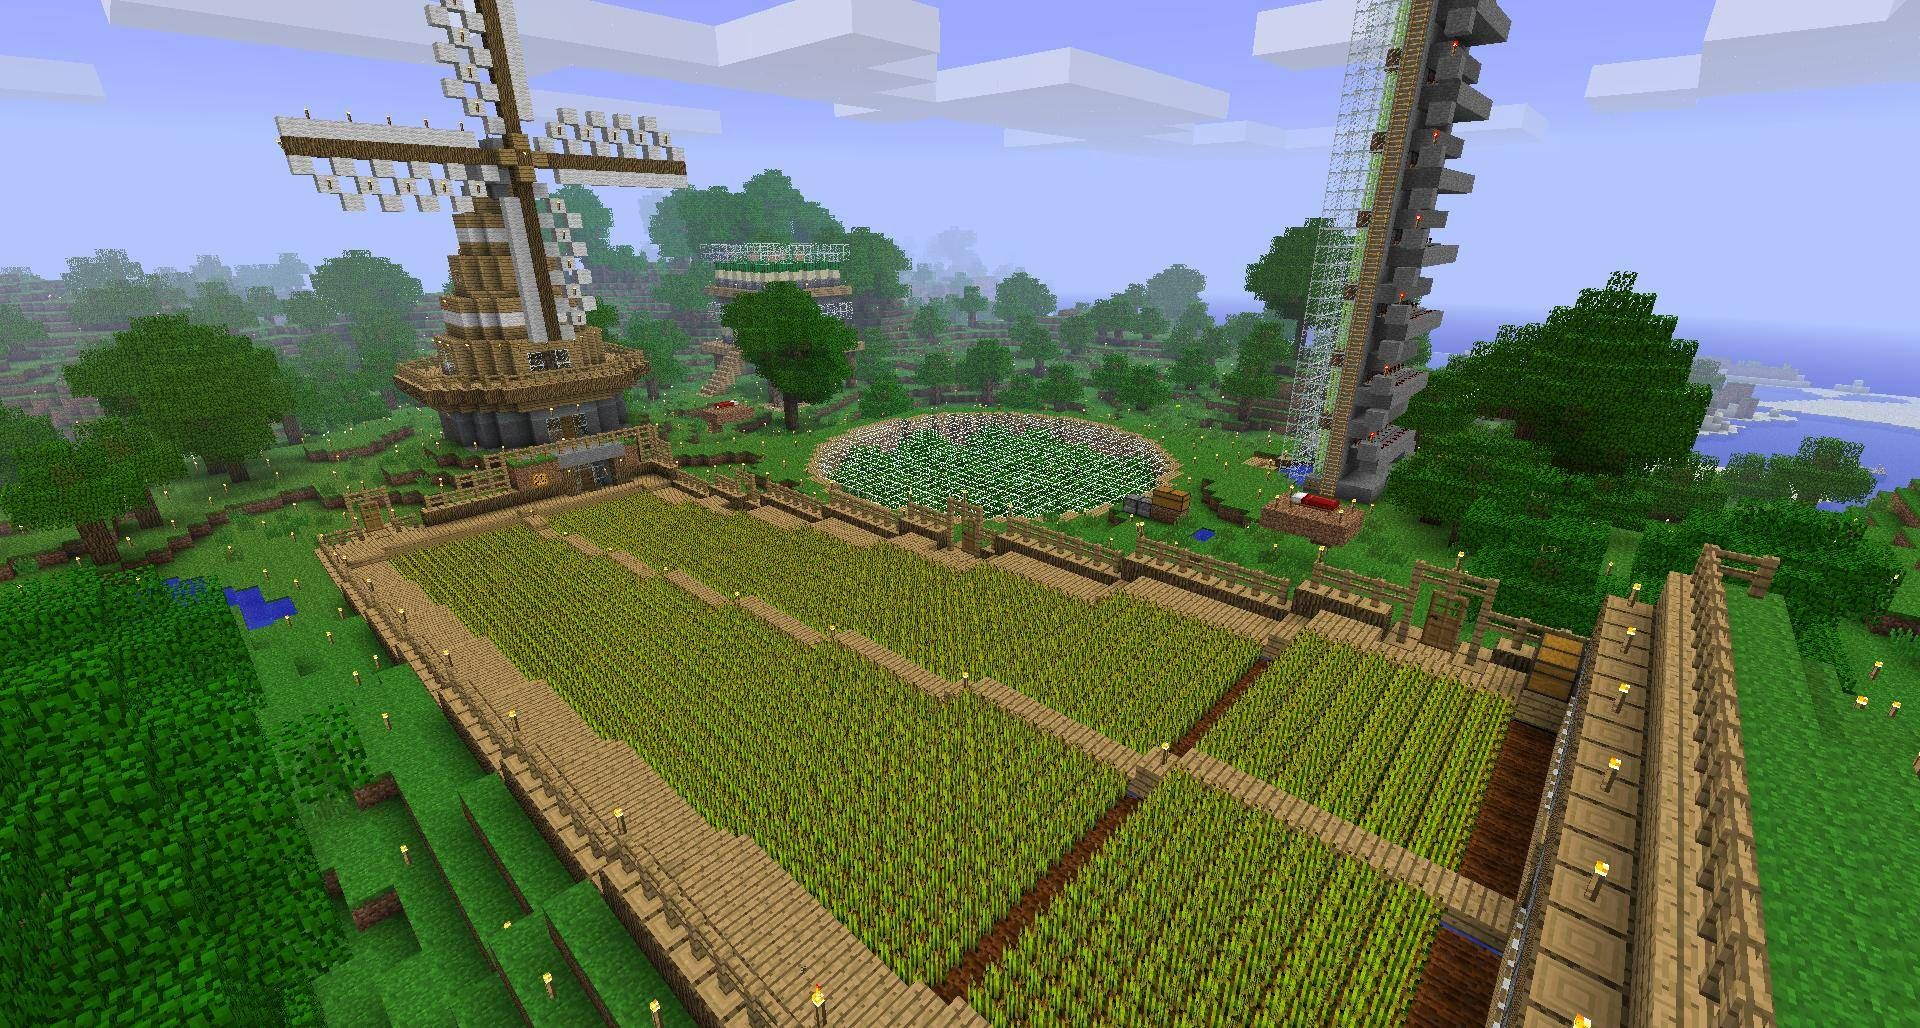 Minecraft Automatic Farm Google Search Minecraft Automatic Farm Minecraft Farm Minecraft